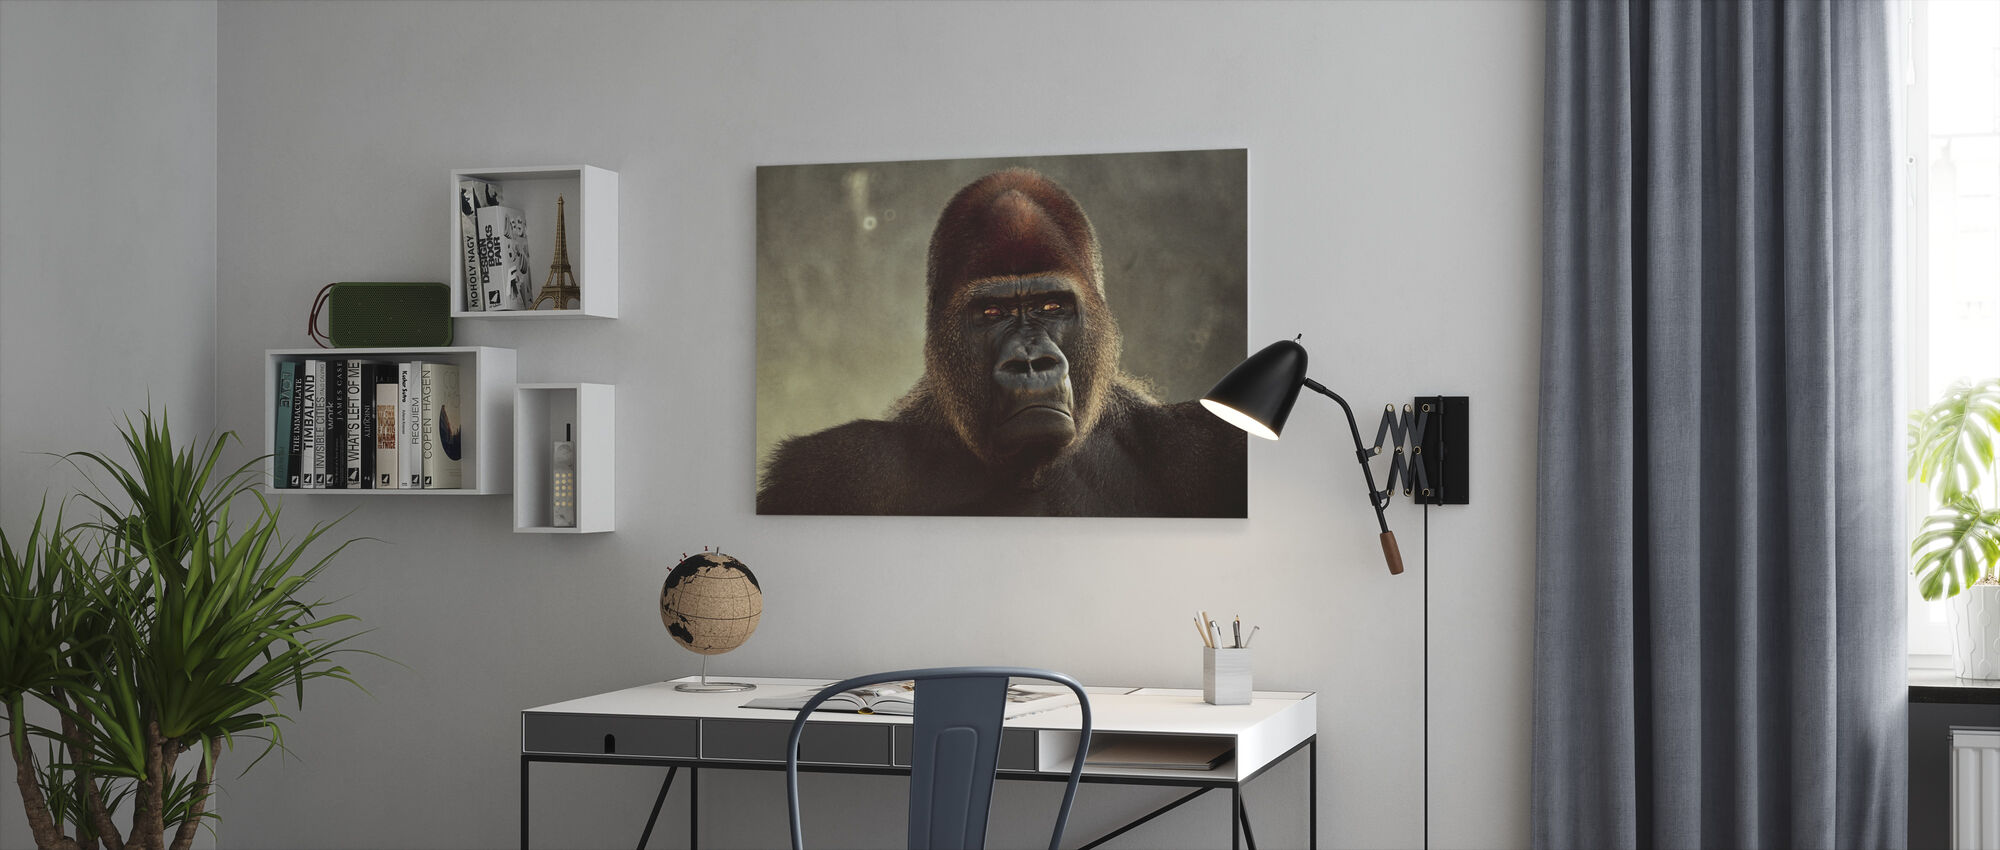 Mäktiga Gorilla - Canvastavla - Kontor